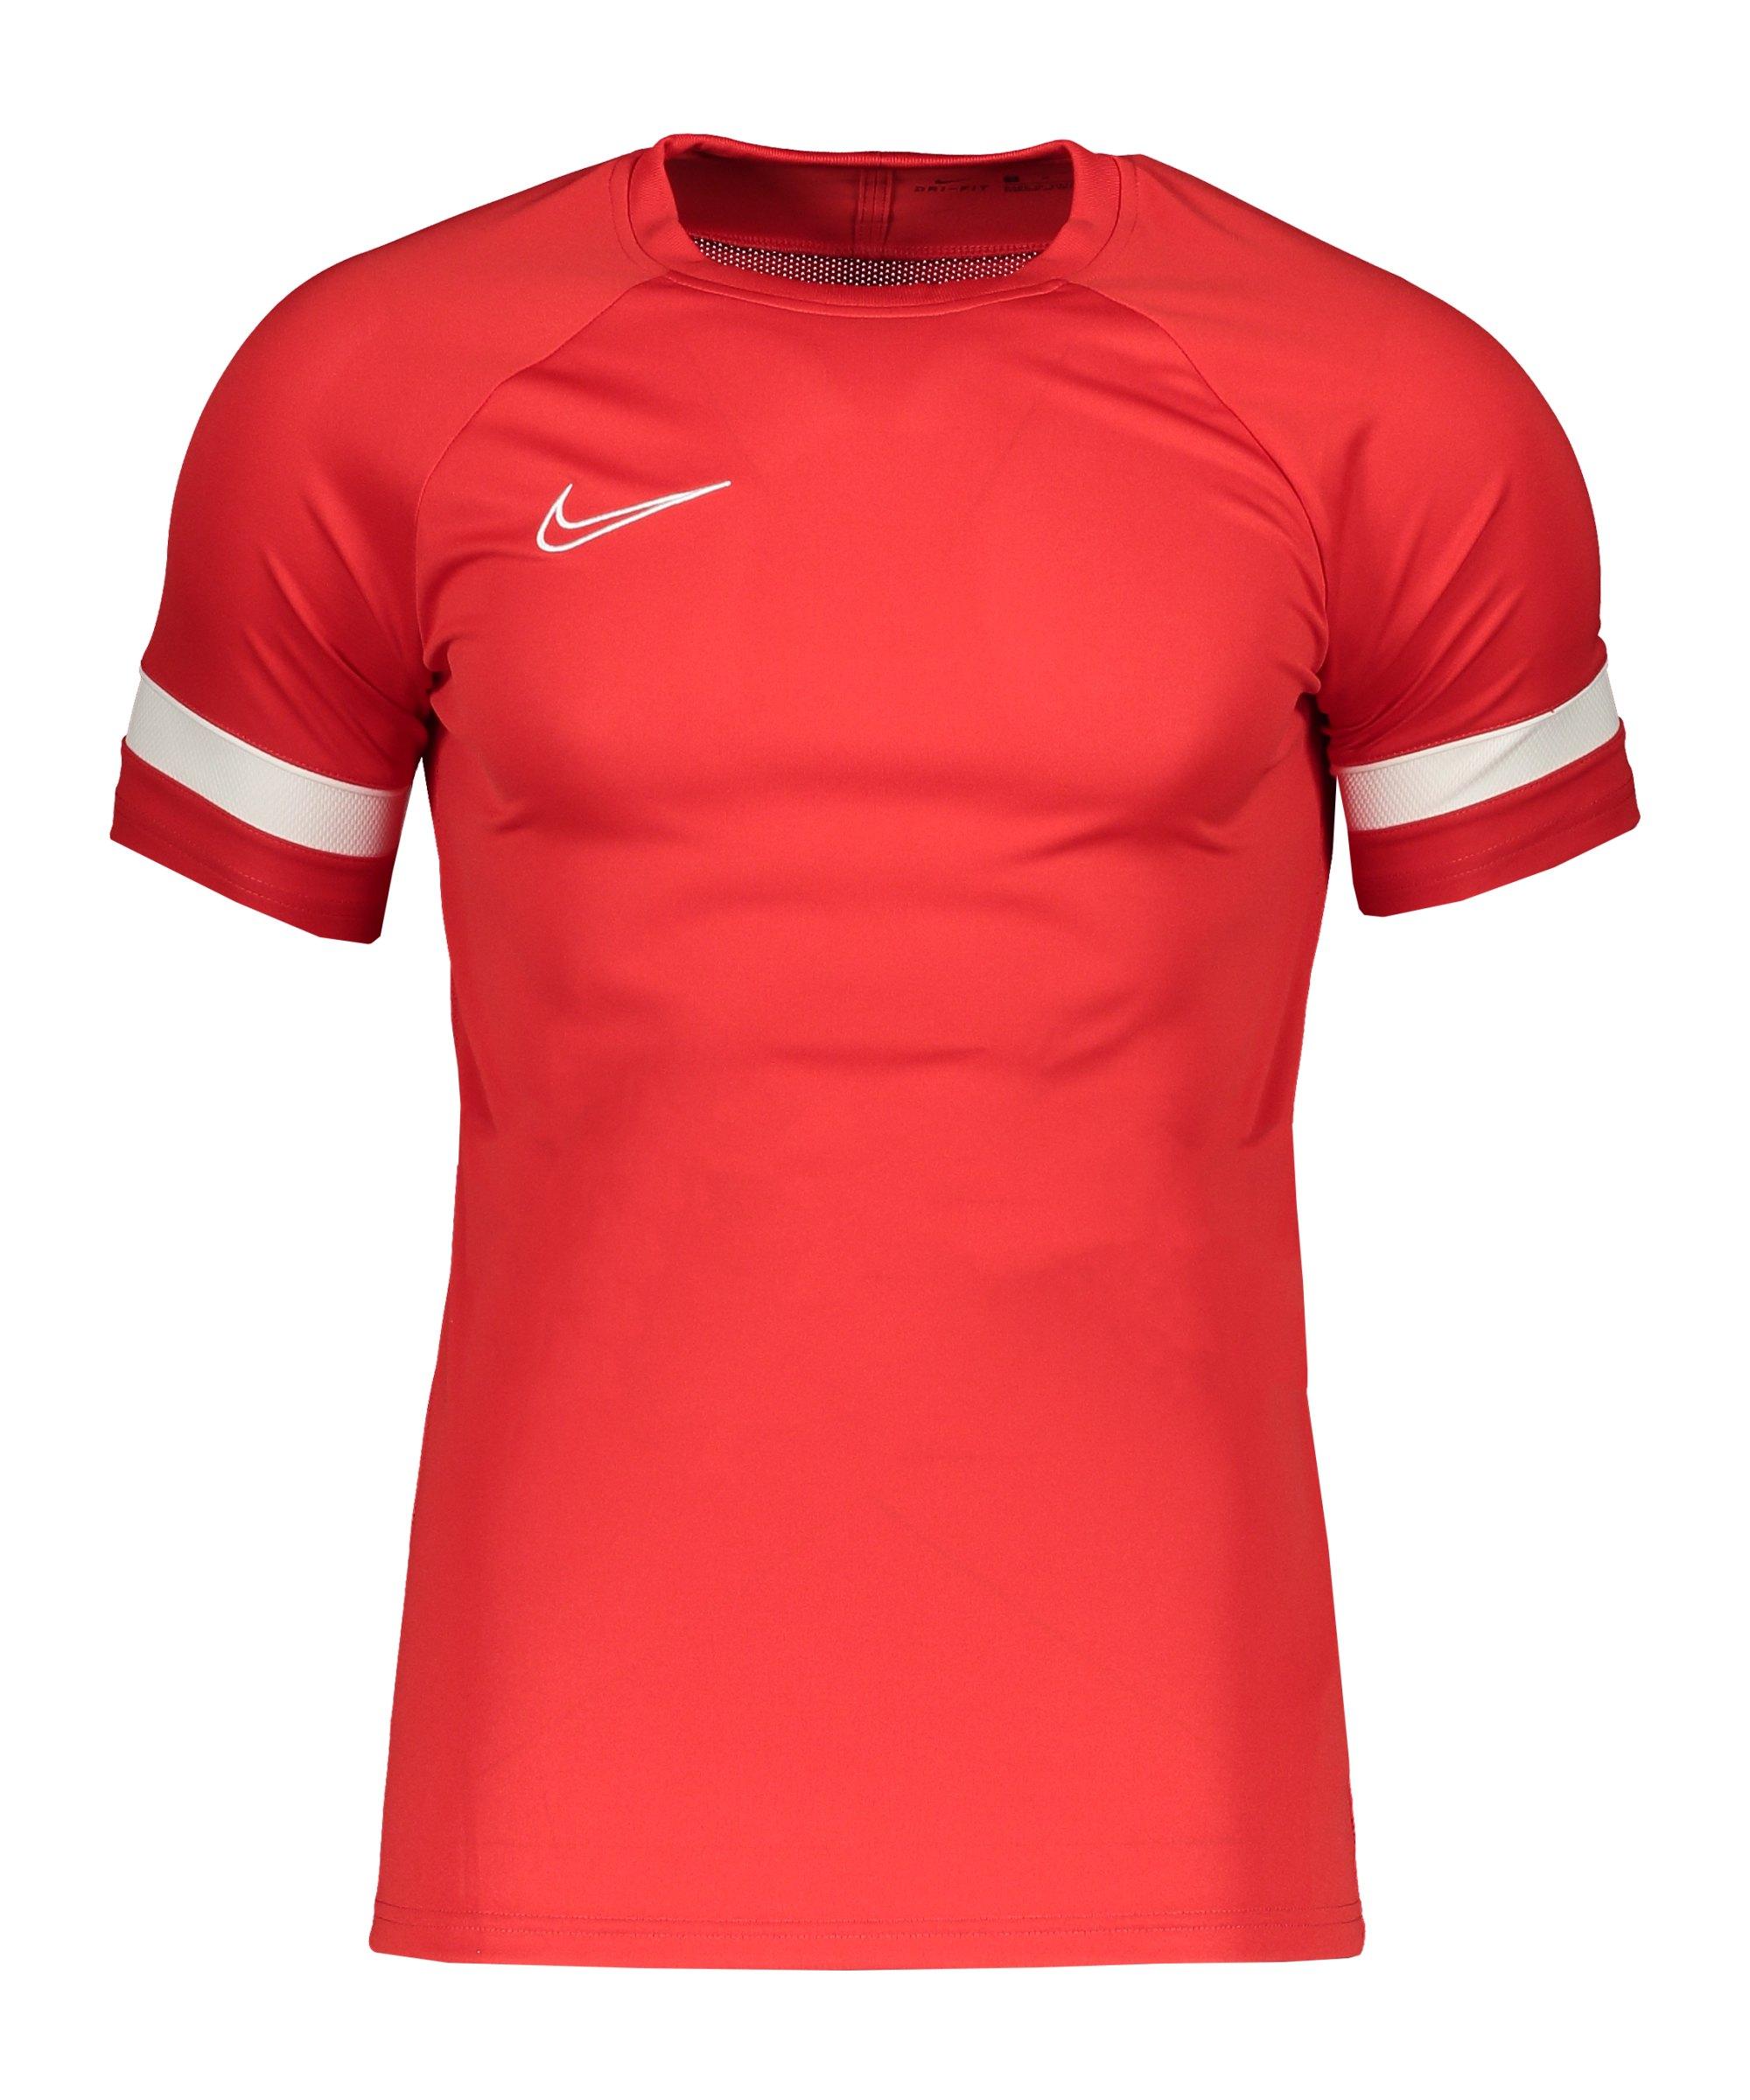 Nike Academy 21 T-Shirt Rot Weiss F658 - rot